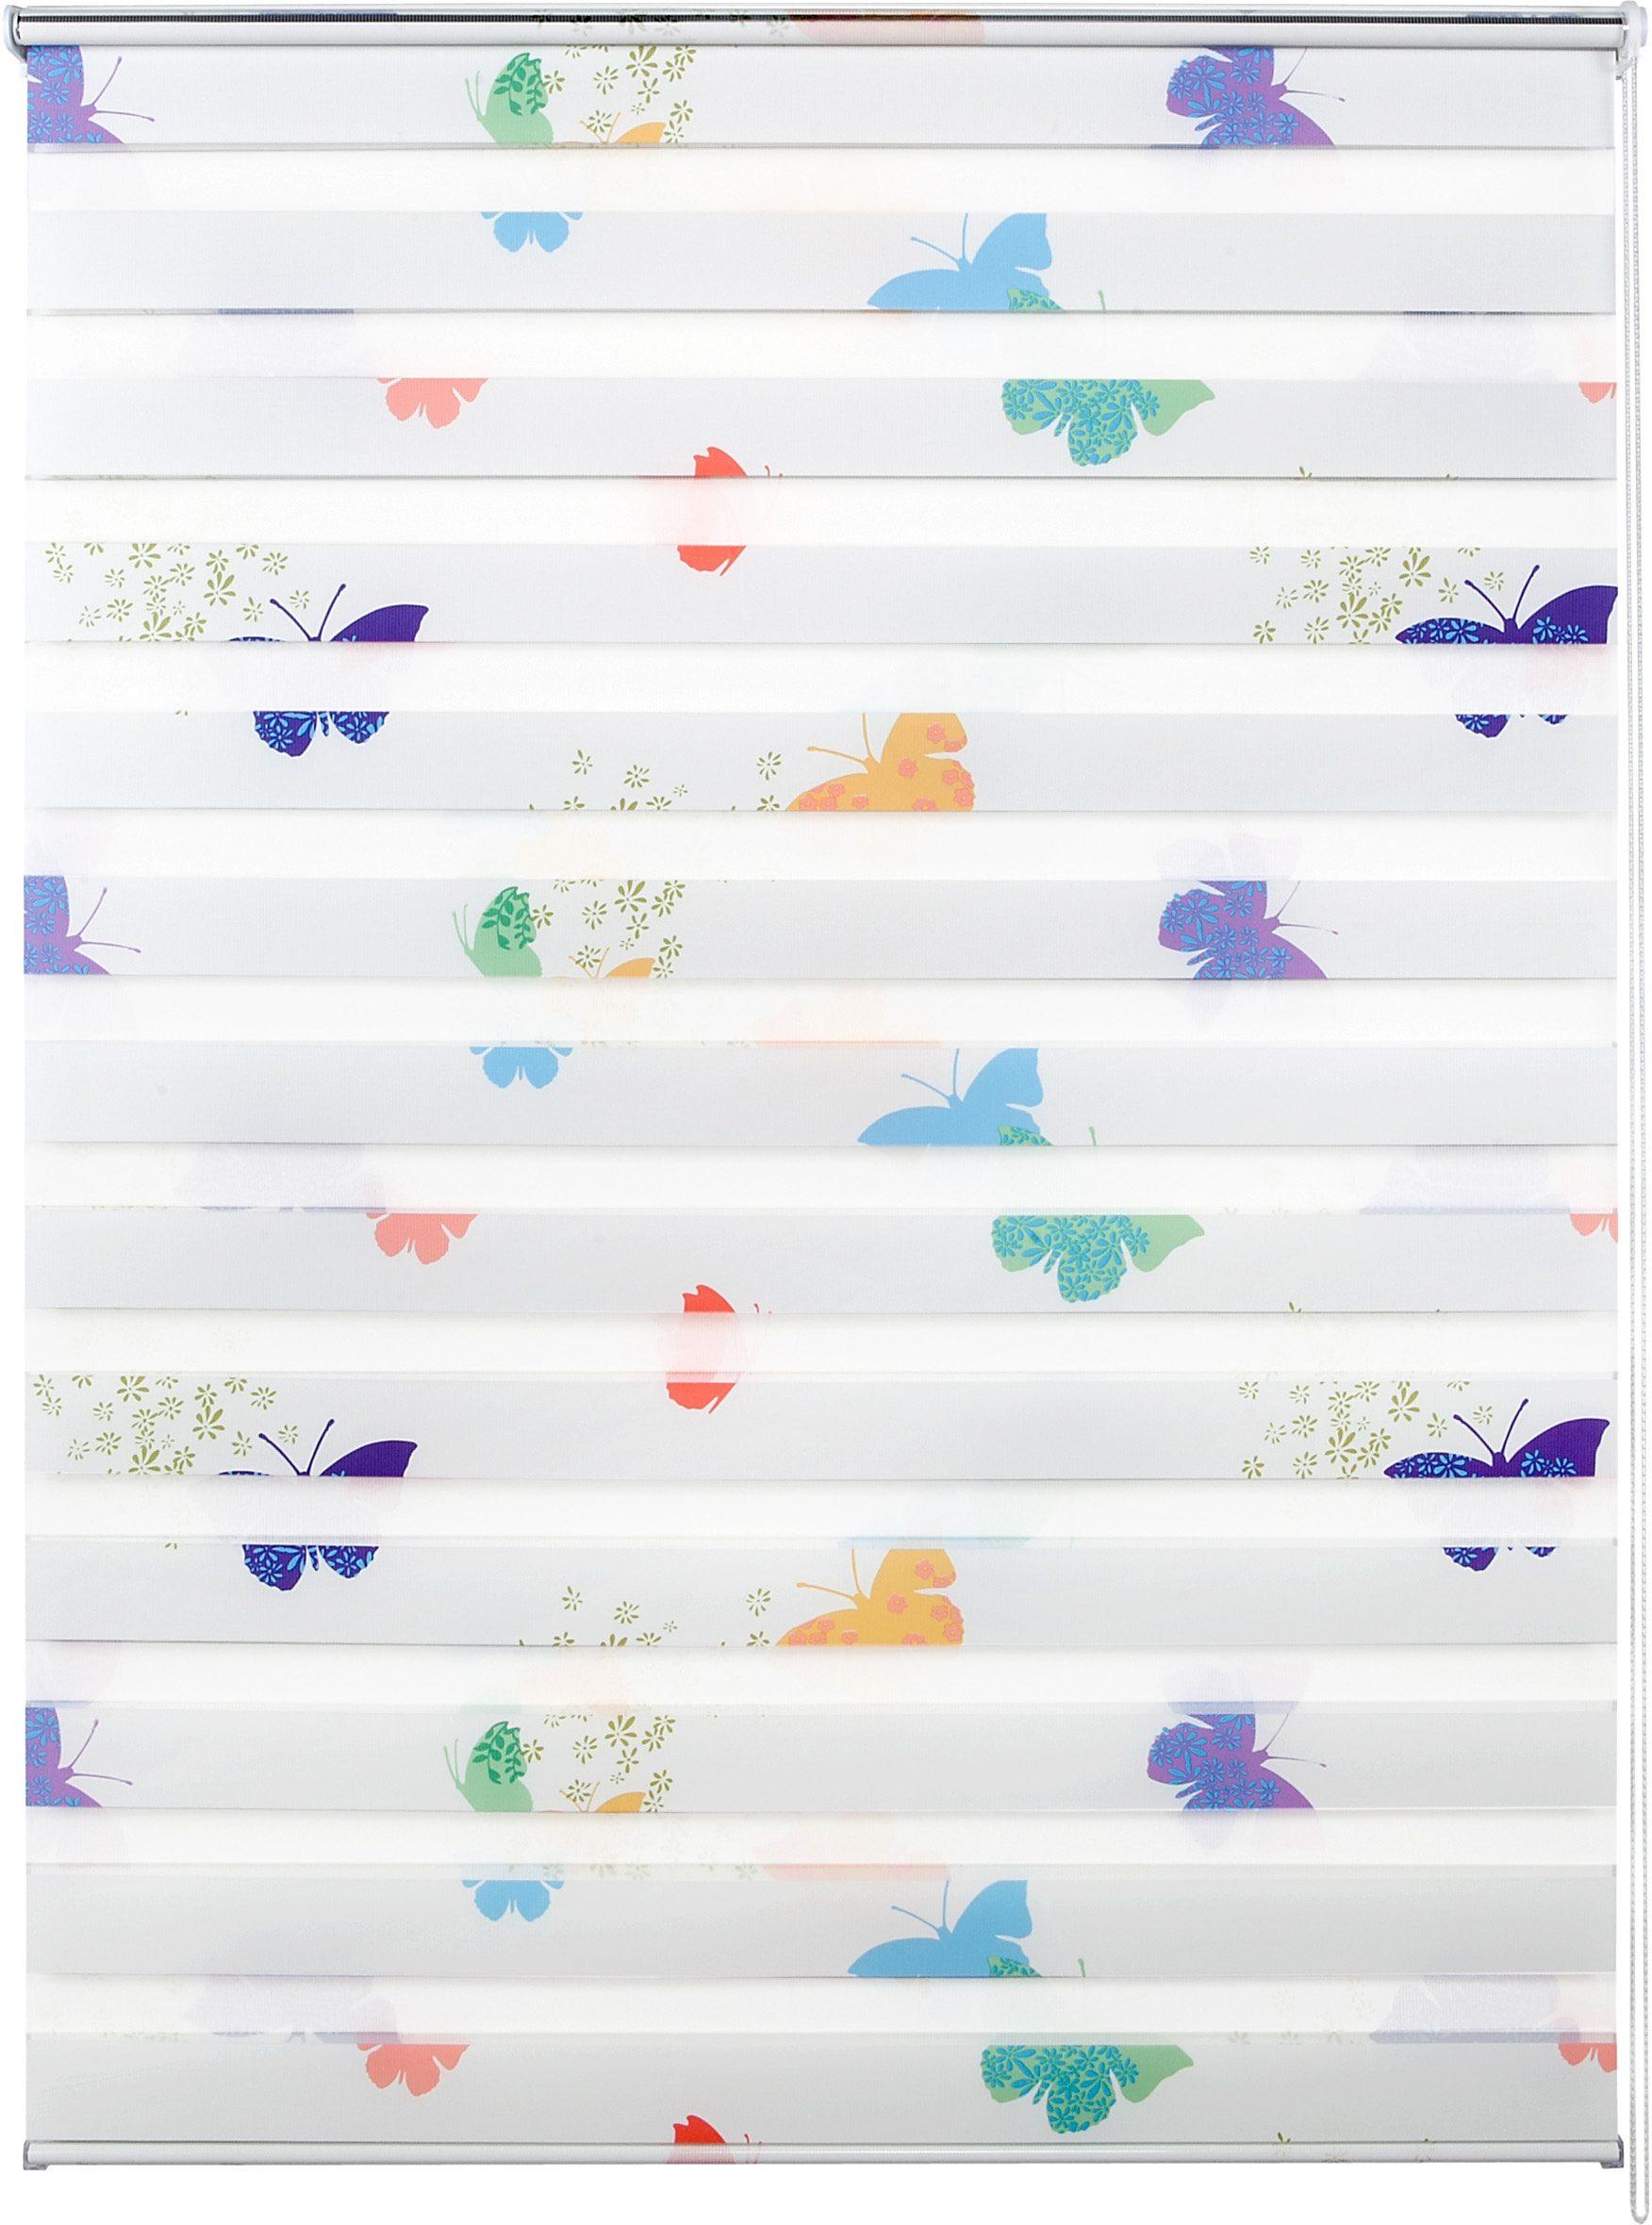 Doppelrollo, Good Life, »Leni«, im Wunschmaß, Rahmenmontage, ohne Bohren, Lichtschutz (1 Stck.), Schmetterlinge